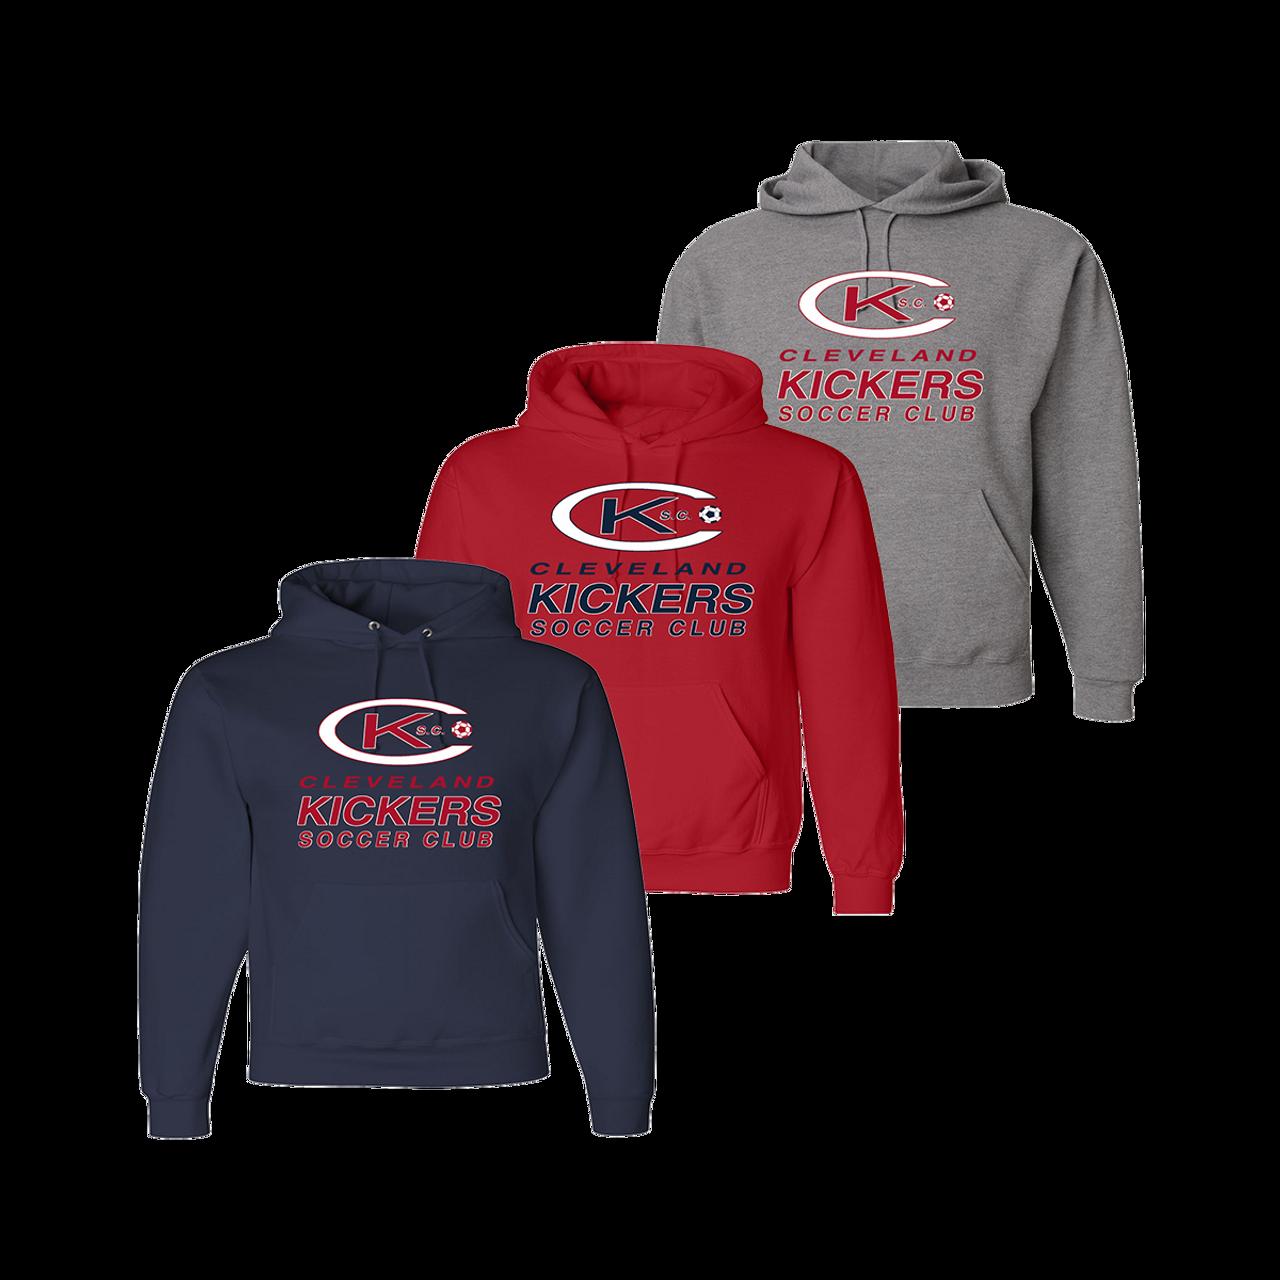 Cleveland Kickers Hooded Sweatshirt (F023F024)